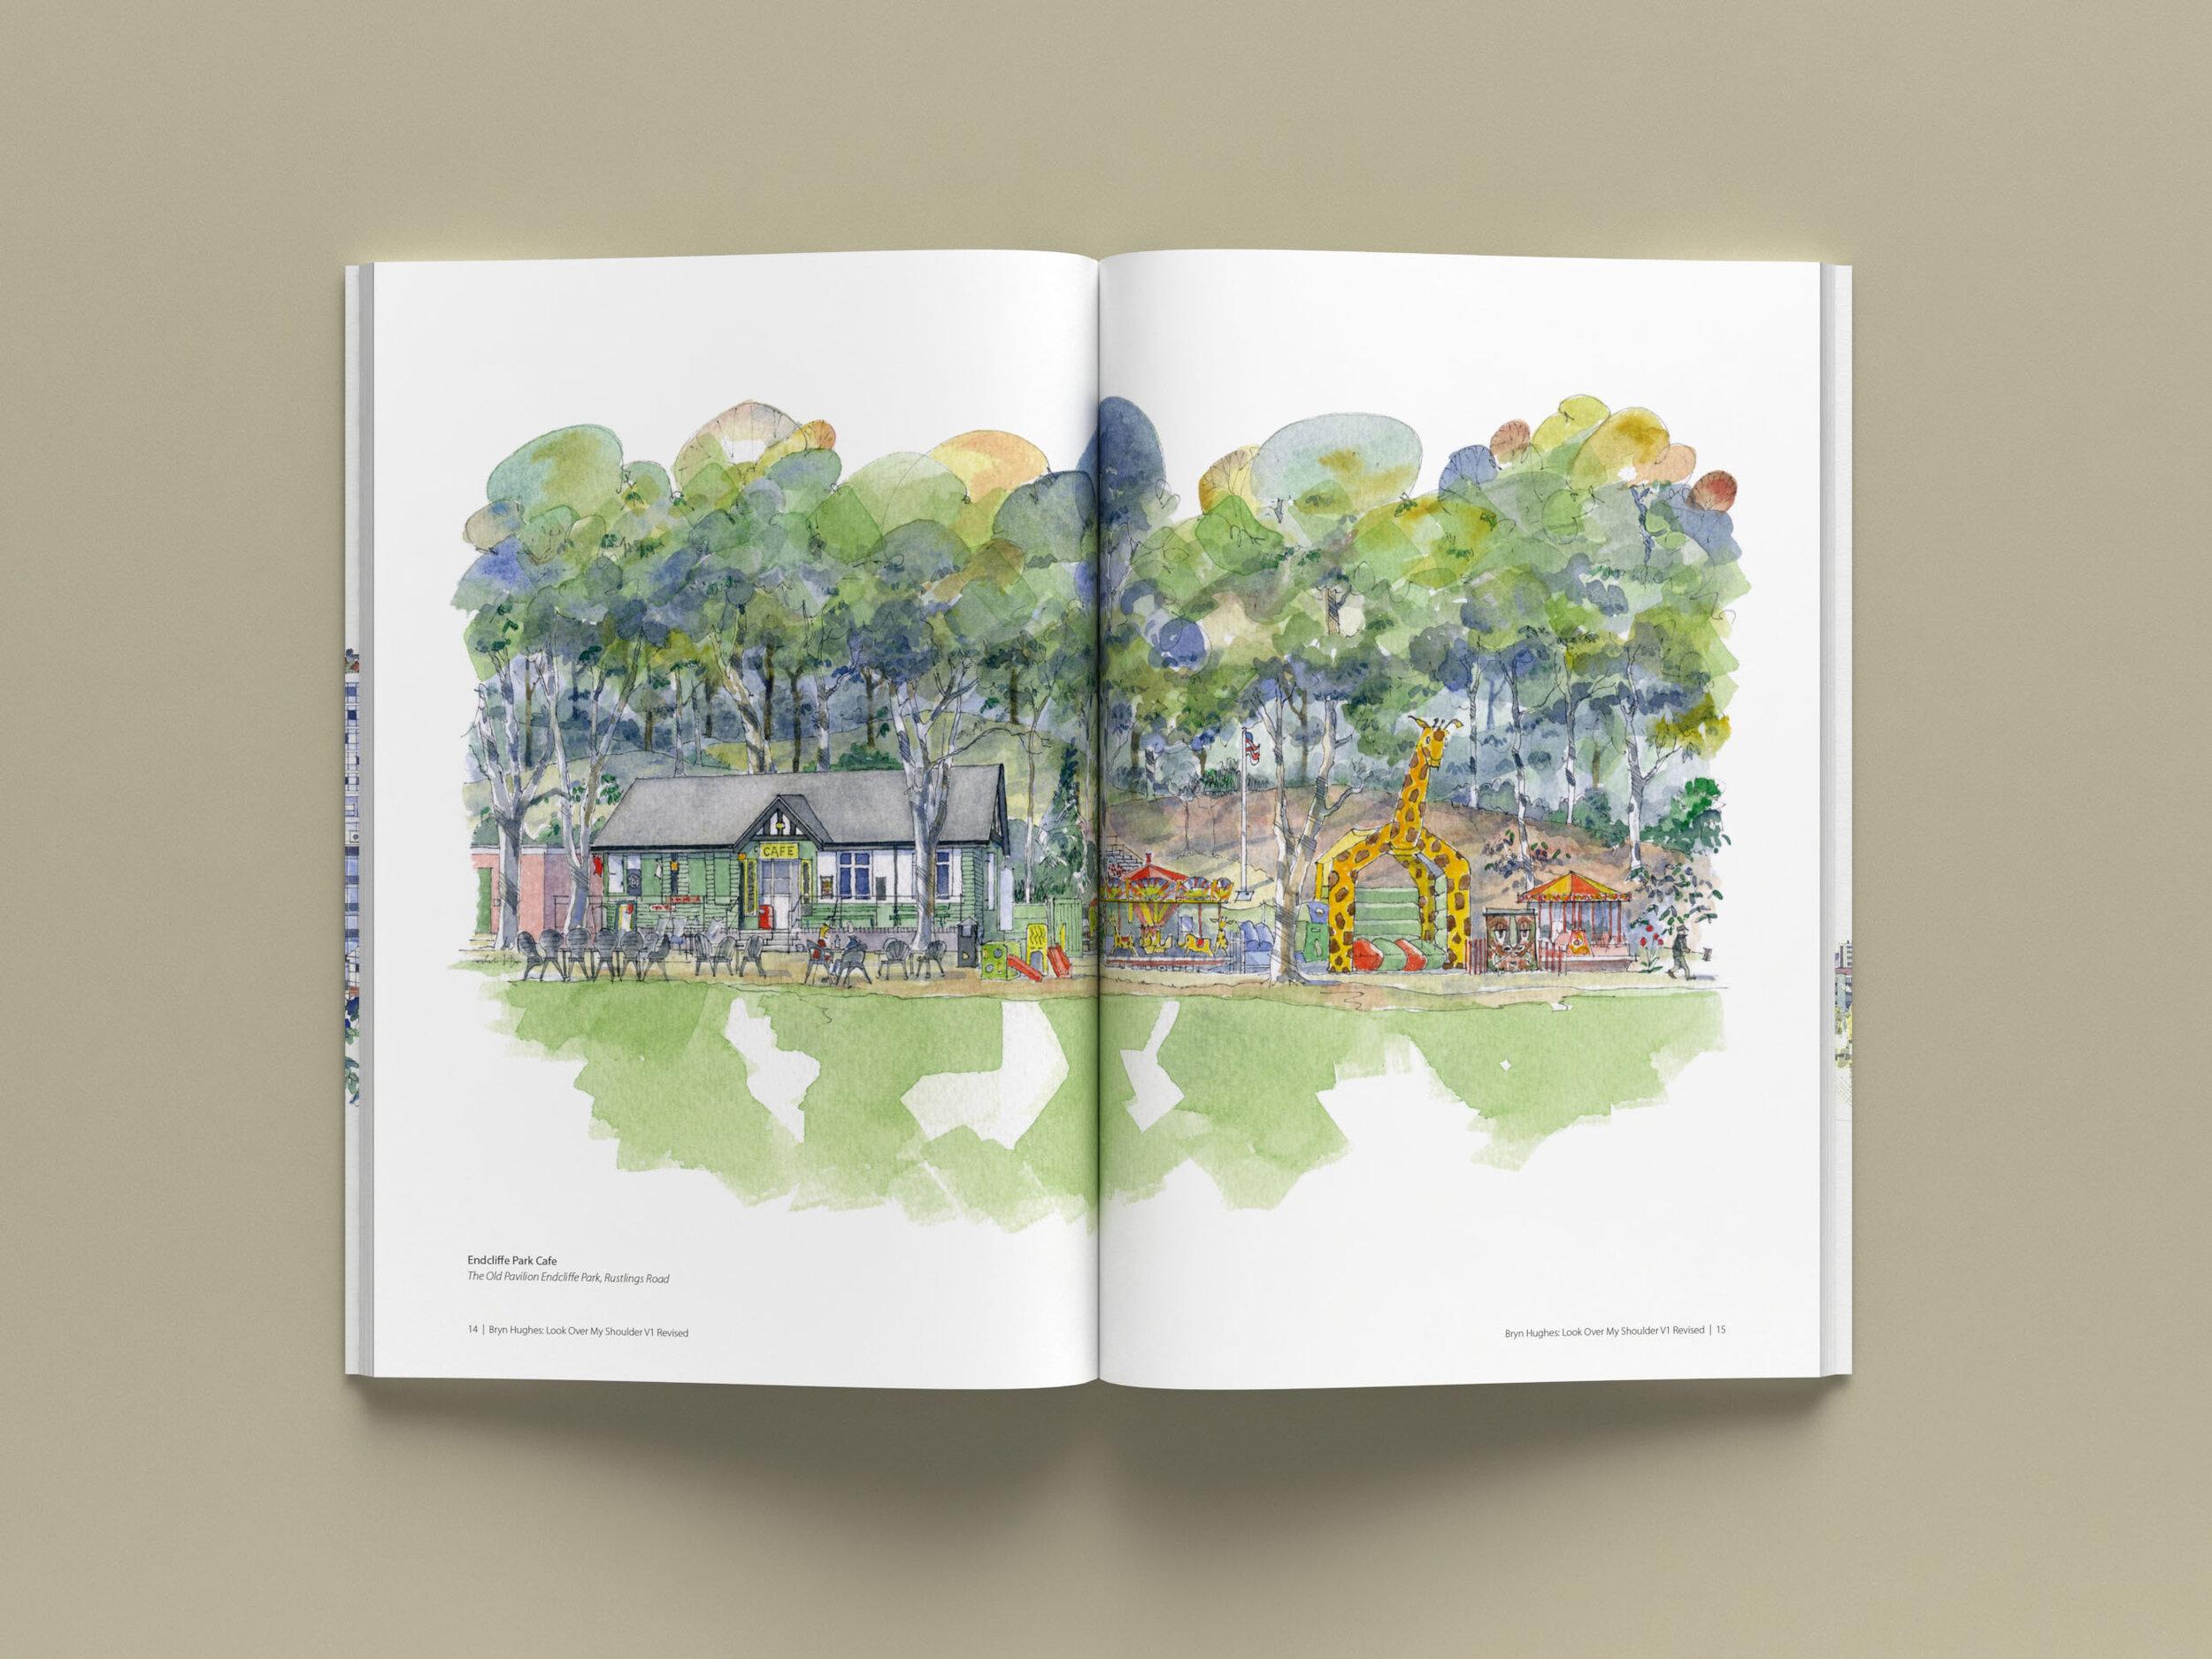 BRYN-HUGHES-ARTIST-SOFTBACK-BOOK02-B-_0034_Group 8.jpg